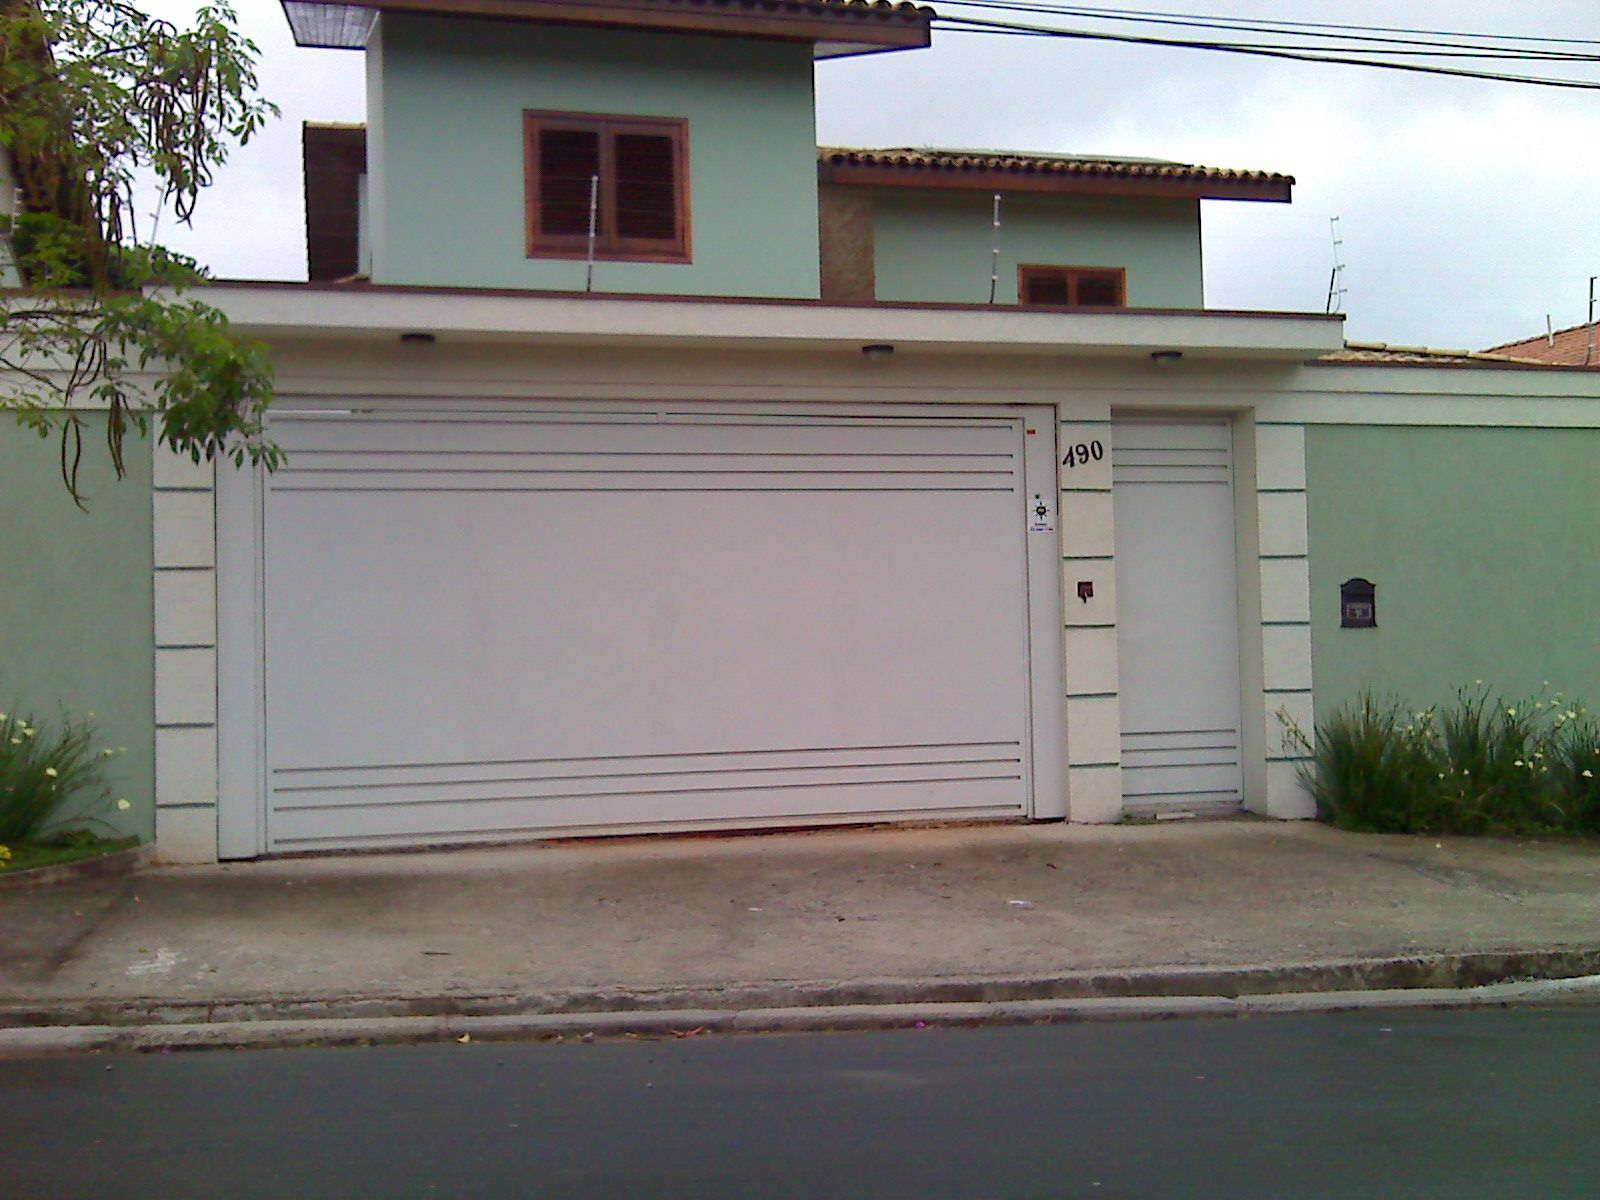 Top Click to Close | Portões-casa | Pinterest | Portões, Porta  HA38